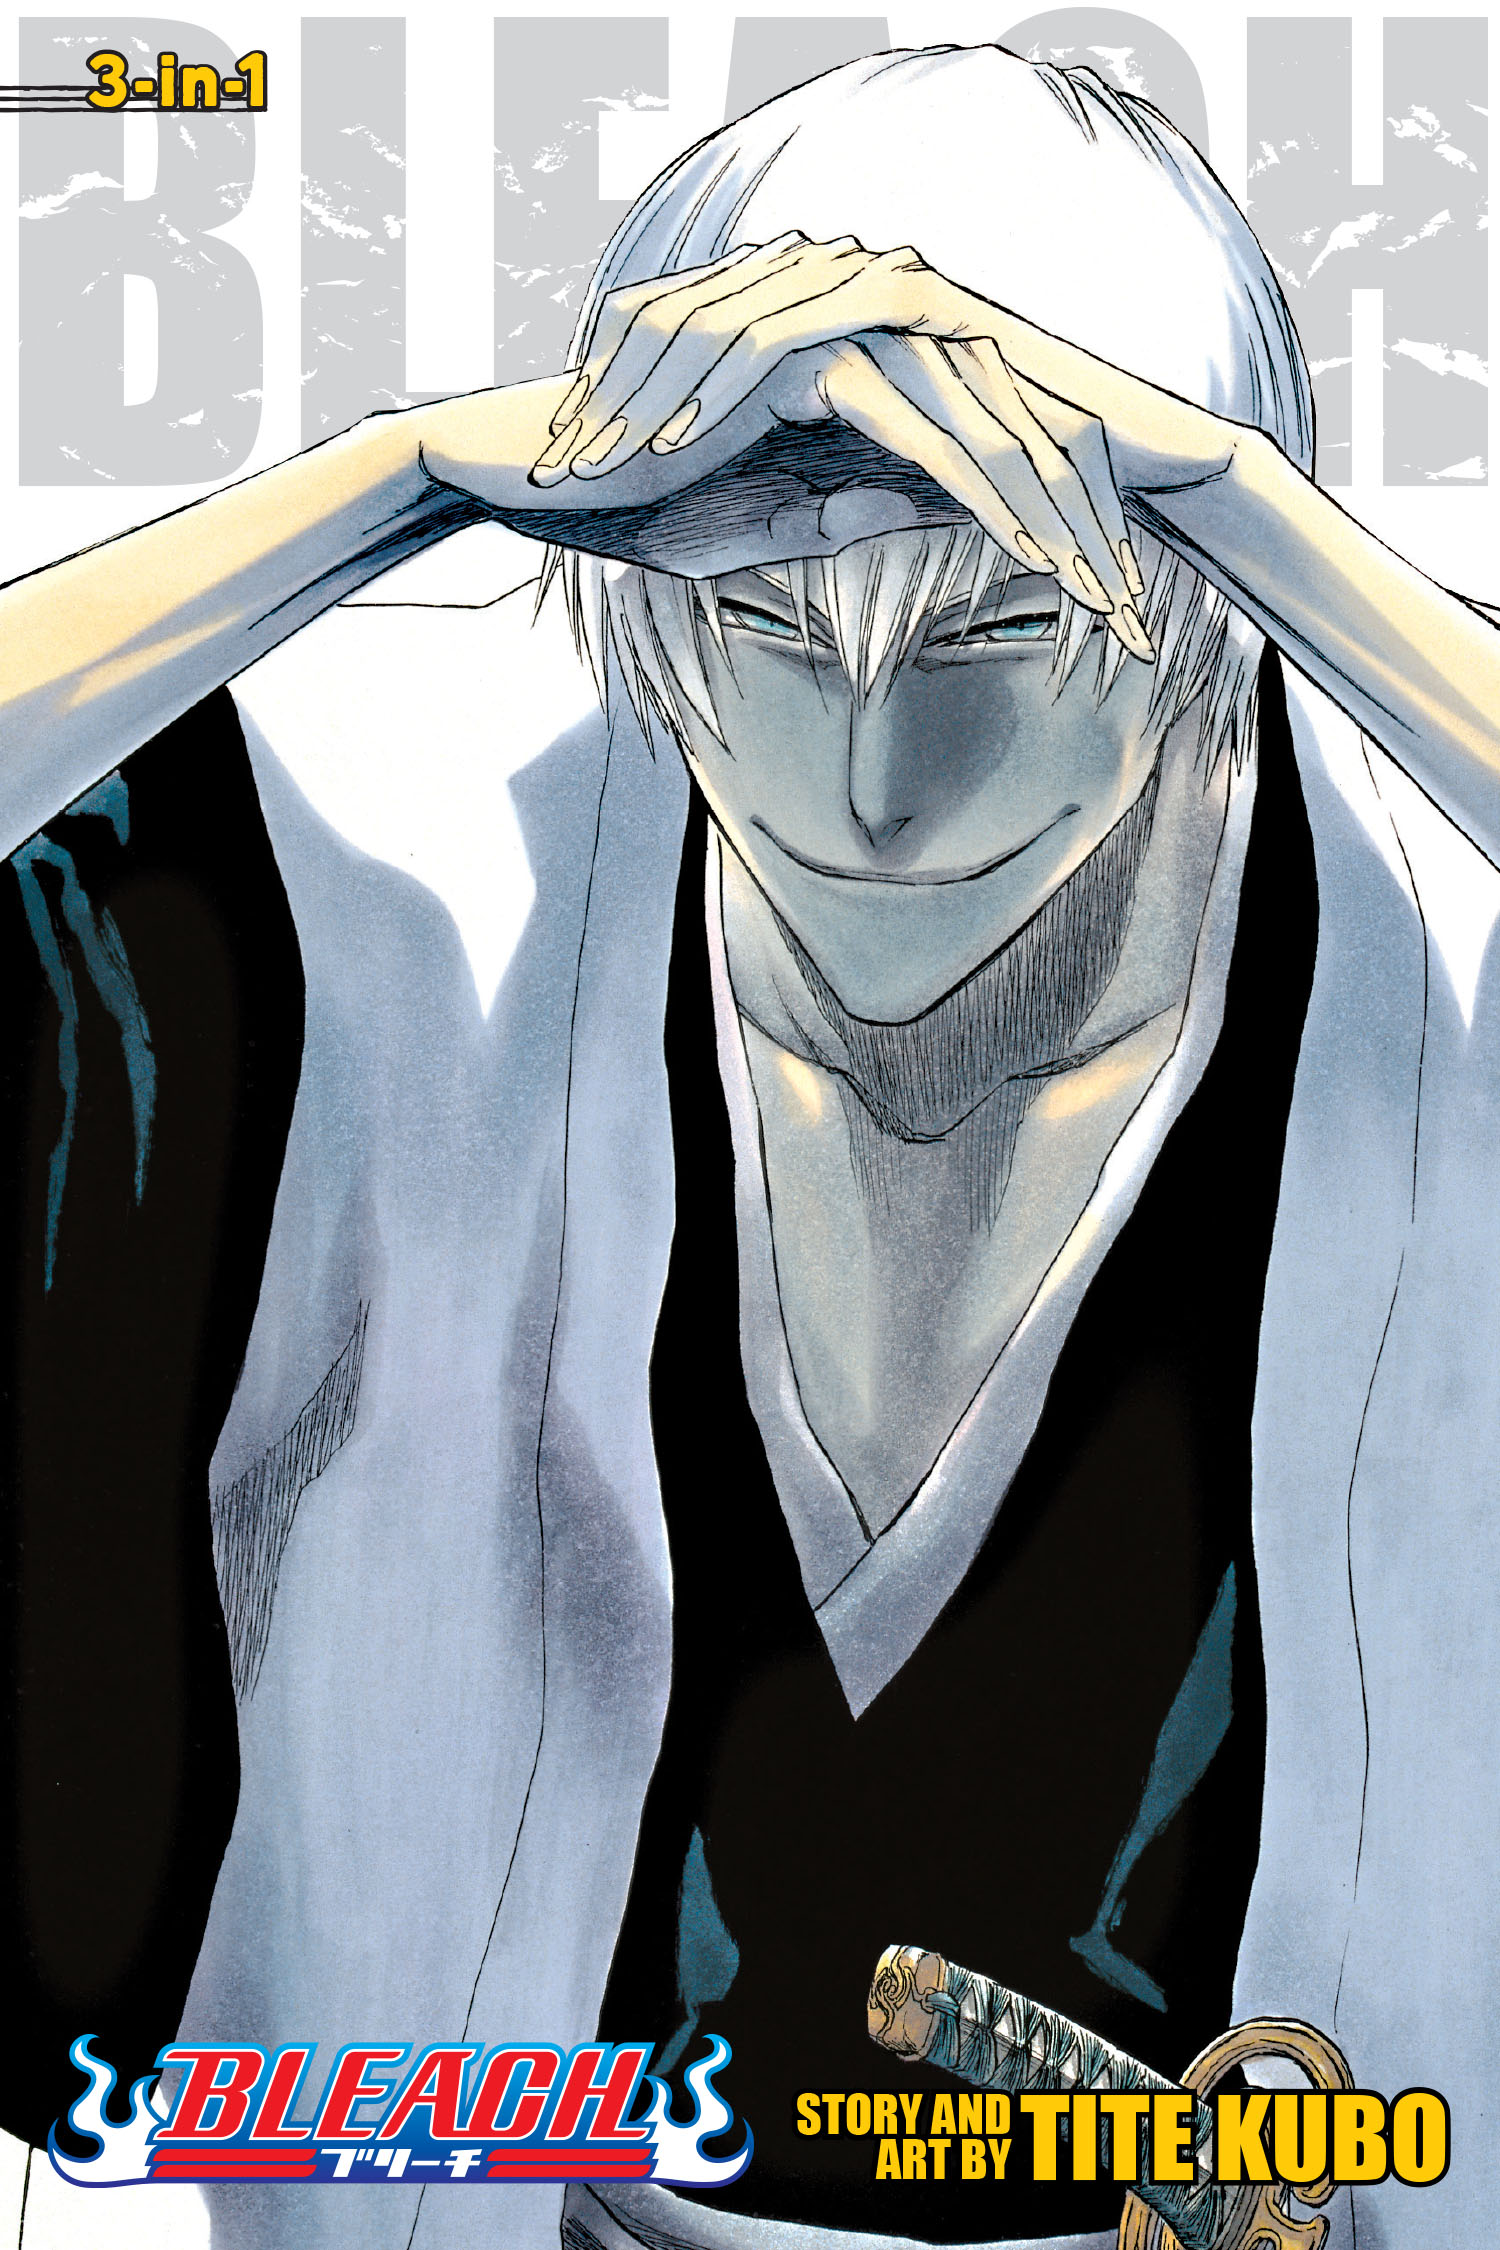 Bleach (3 in 1 edition) vol 7 9781421559117 hr